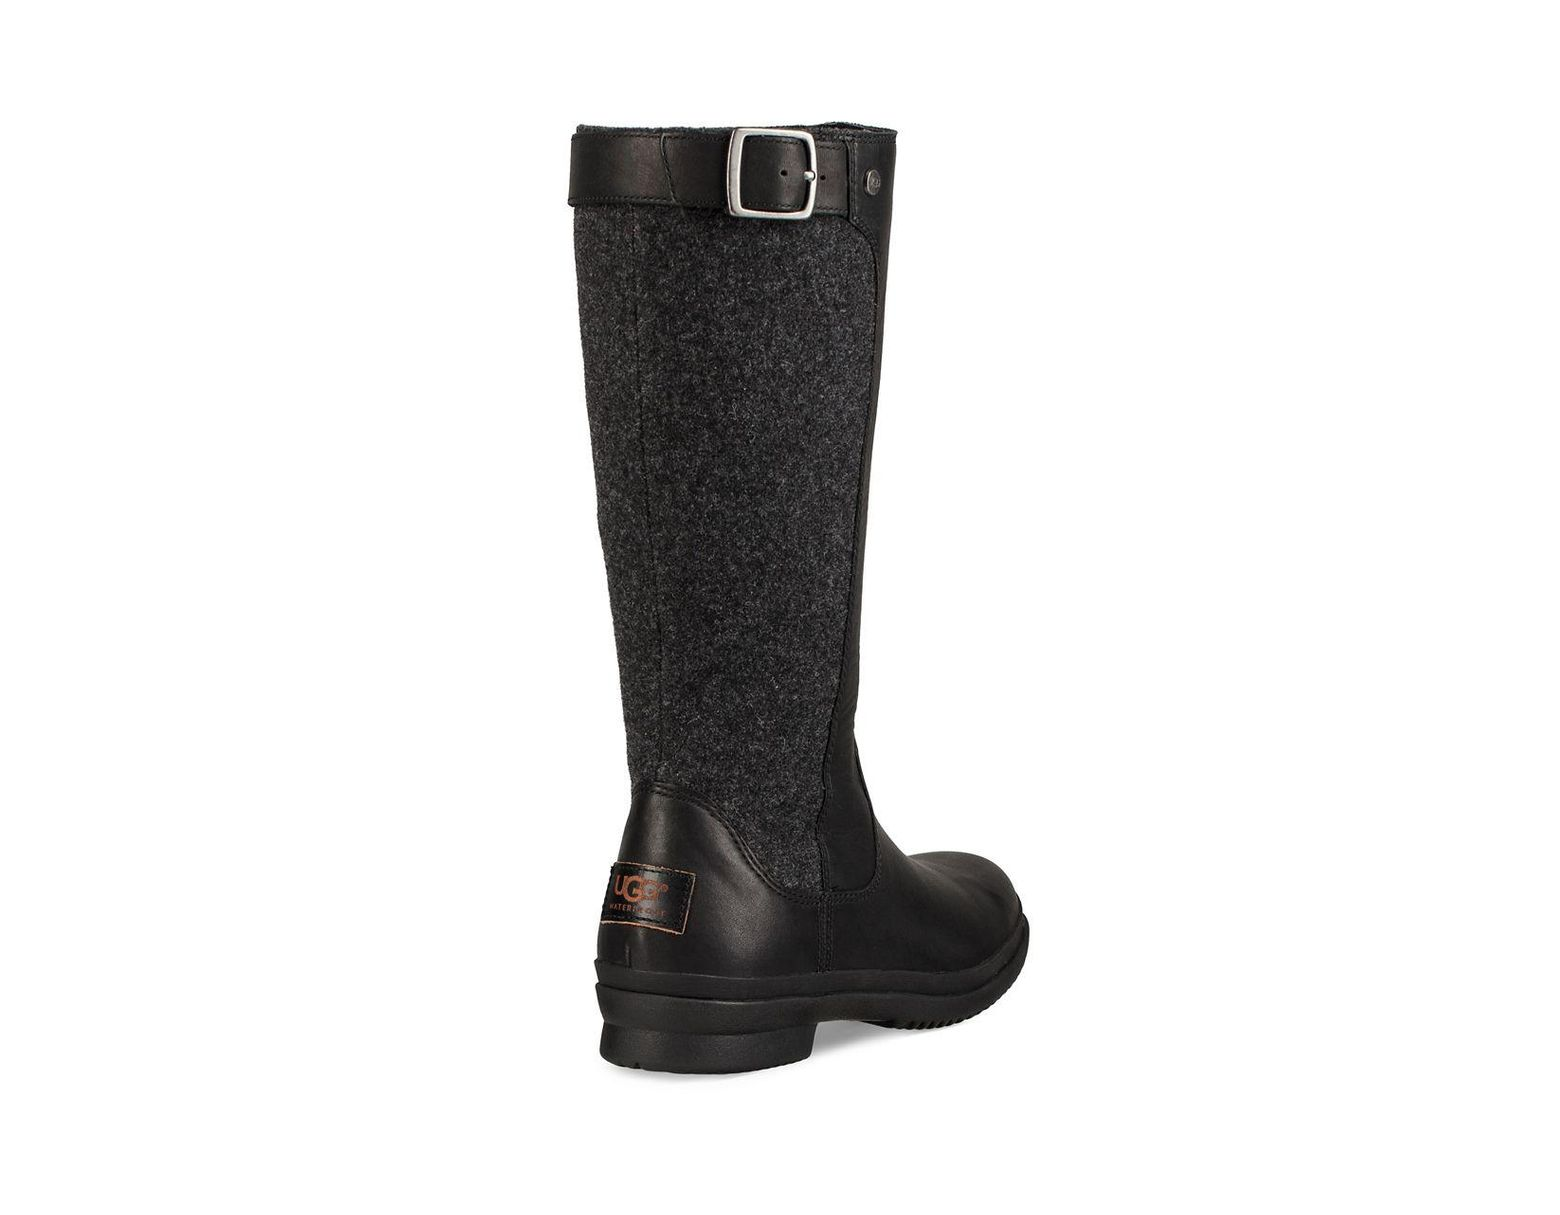 12fe2a3abb9 Black Women's Janina Mid-calf Dyed Fur Boots